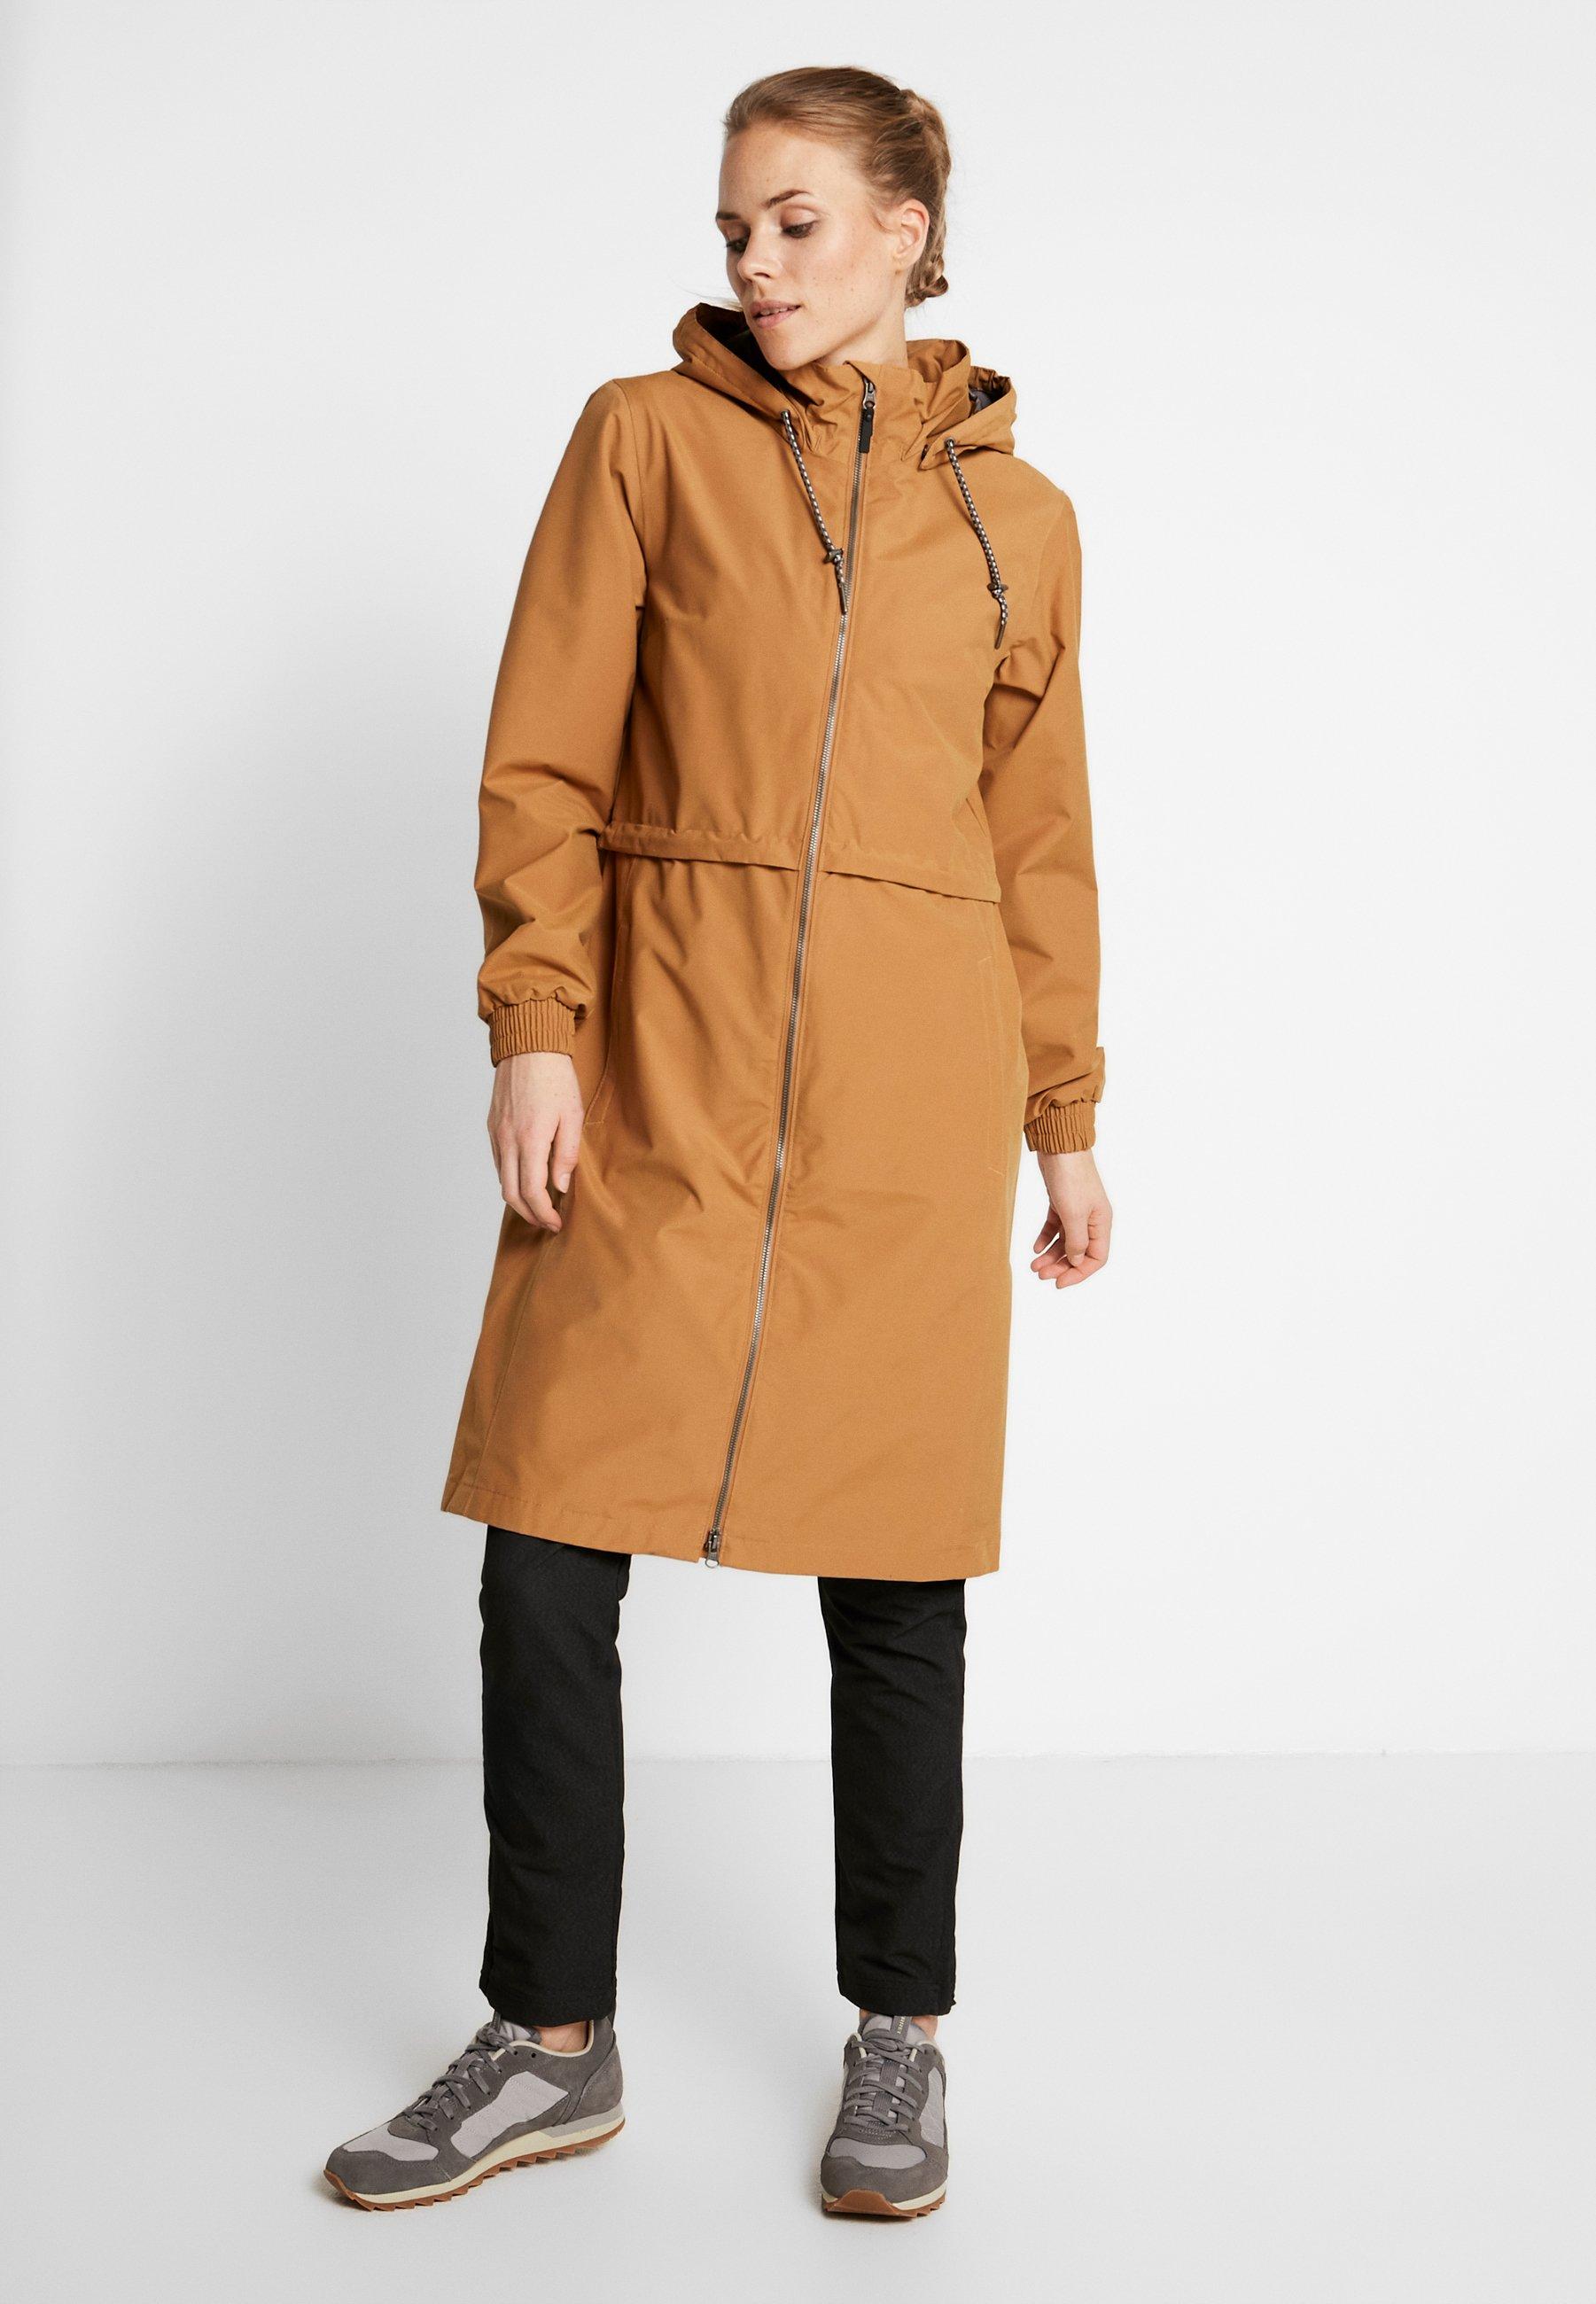 Firwood™ Mantel für Damen | Columbia Sportswear